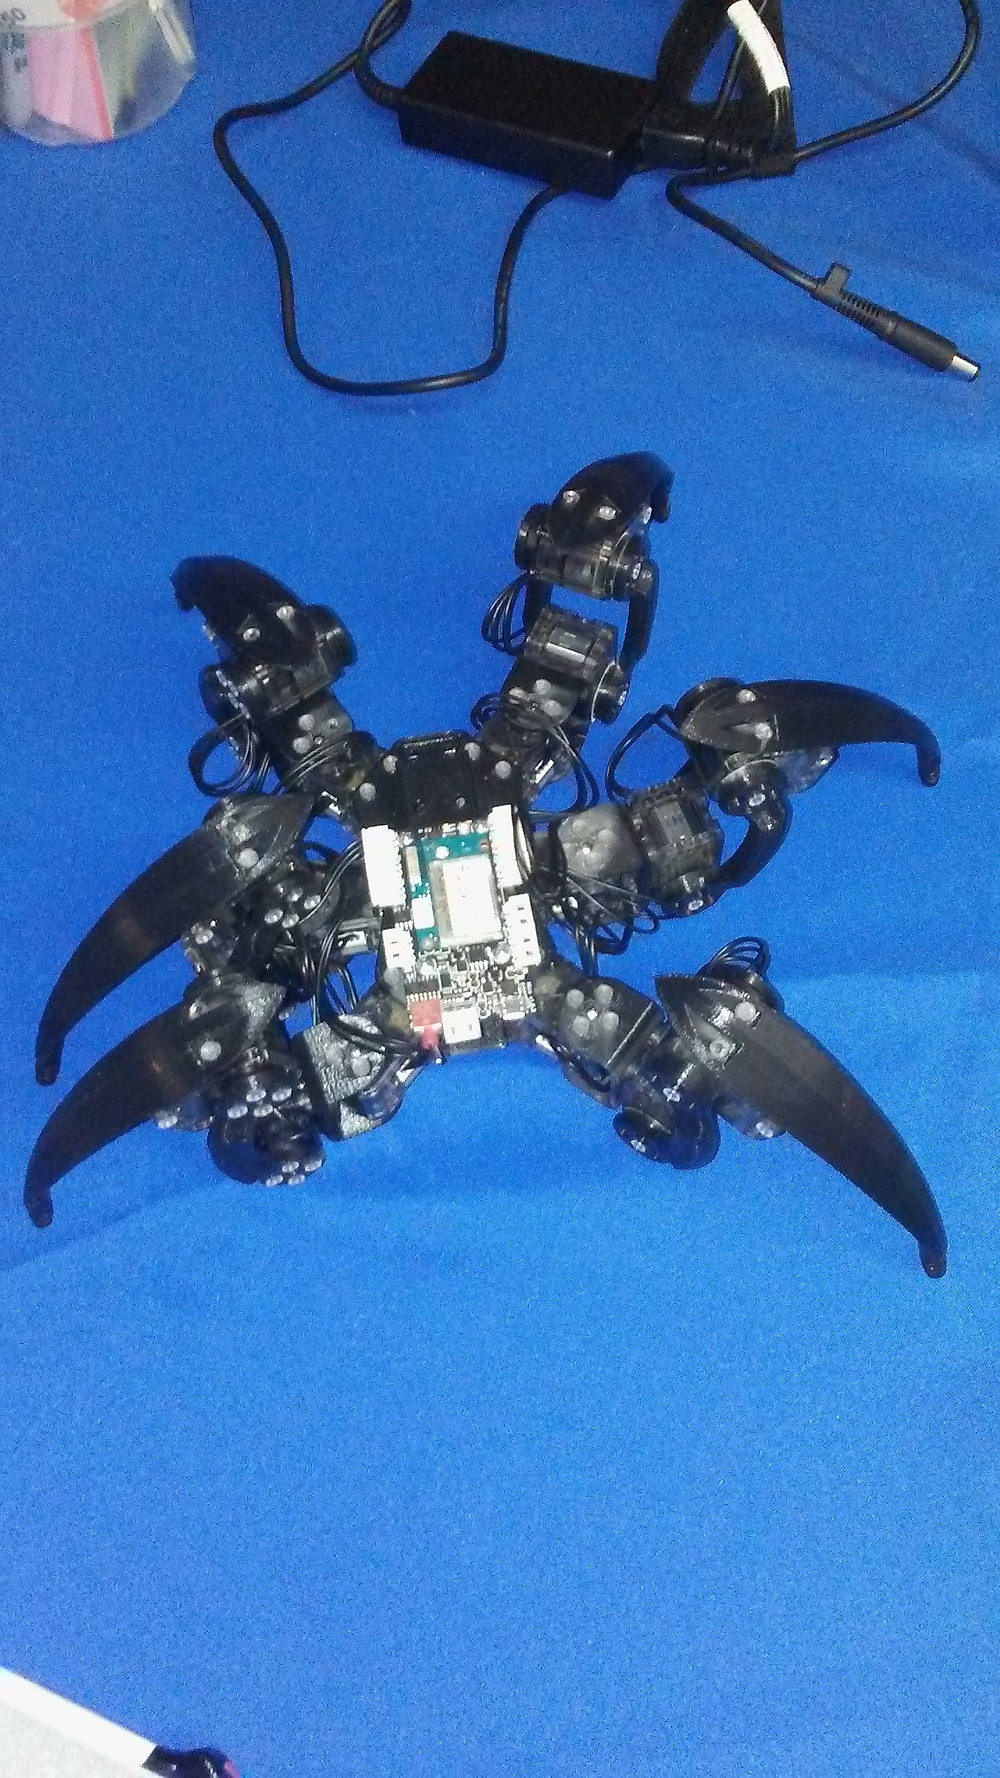 3D printed spider robot